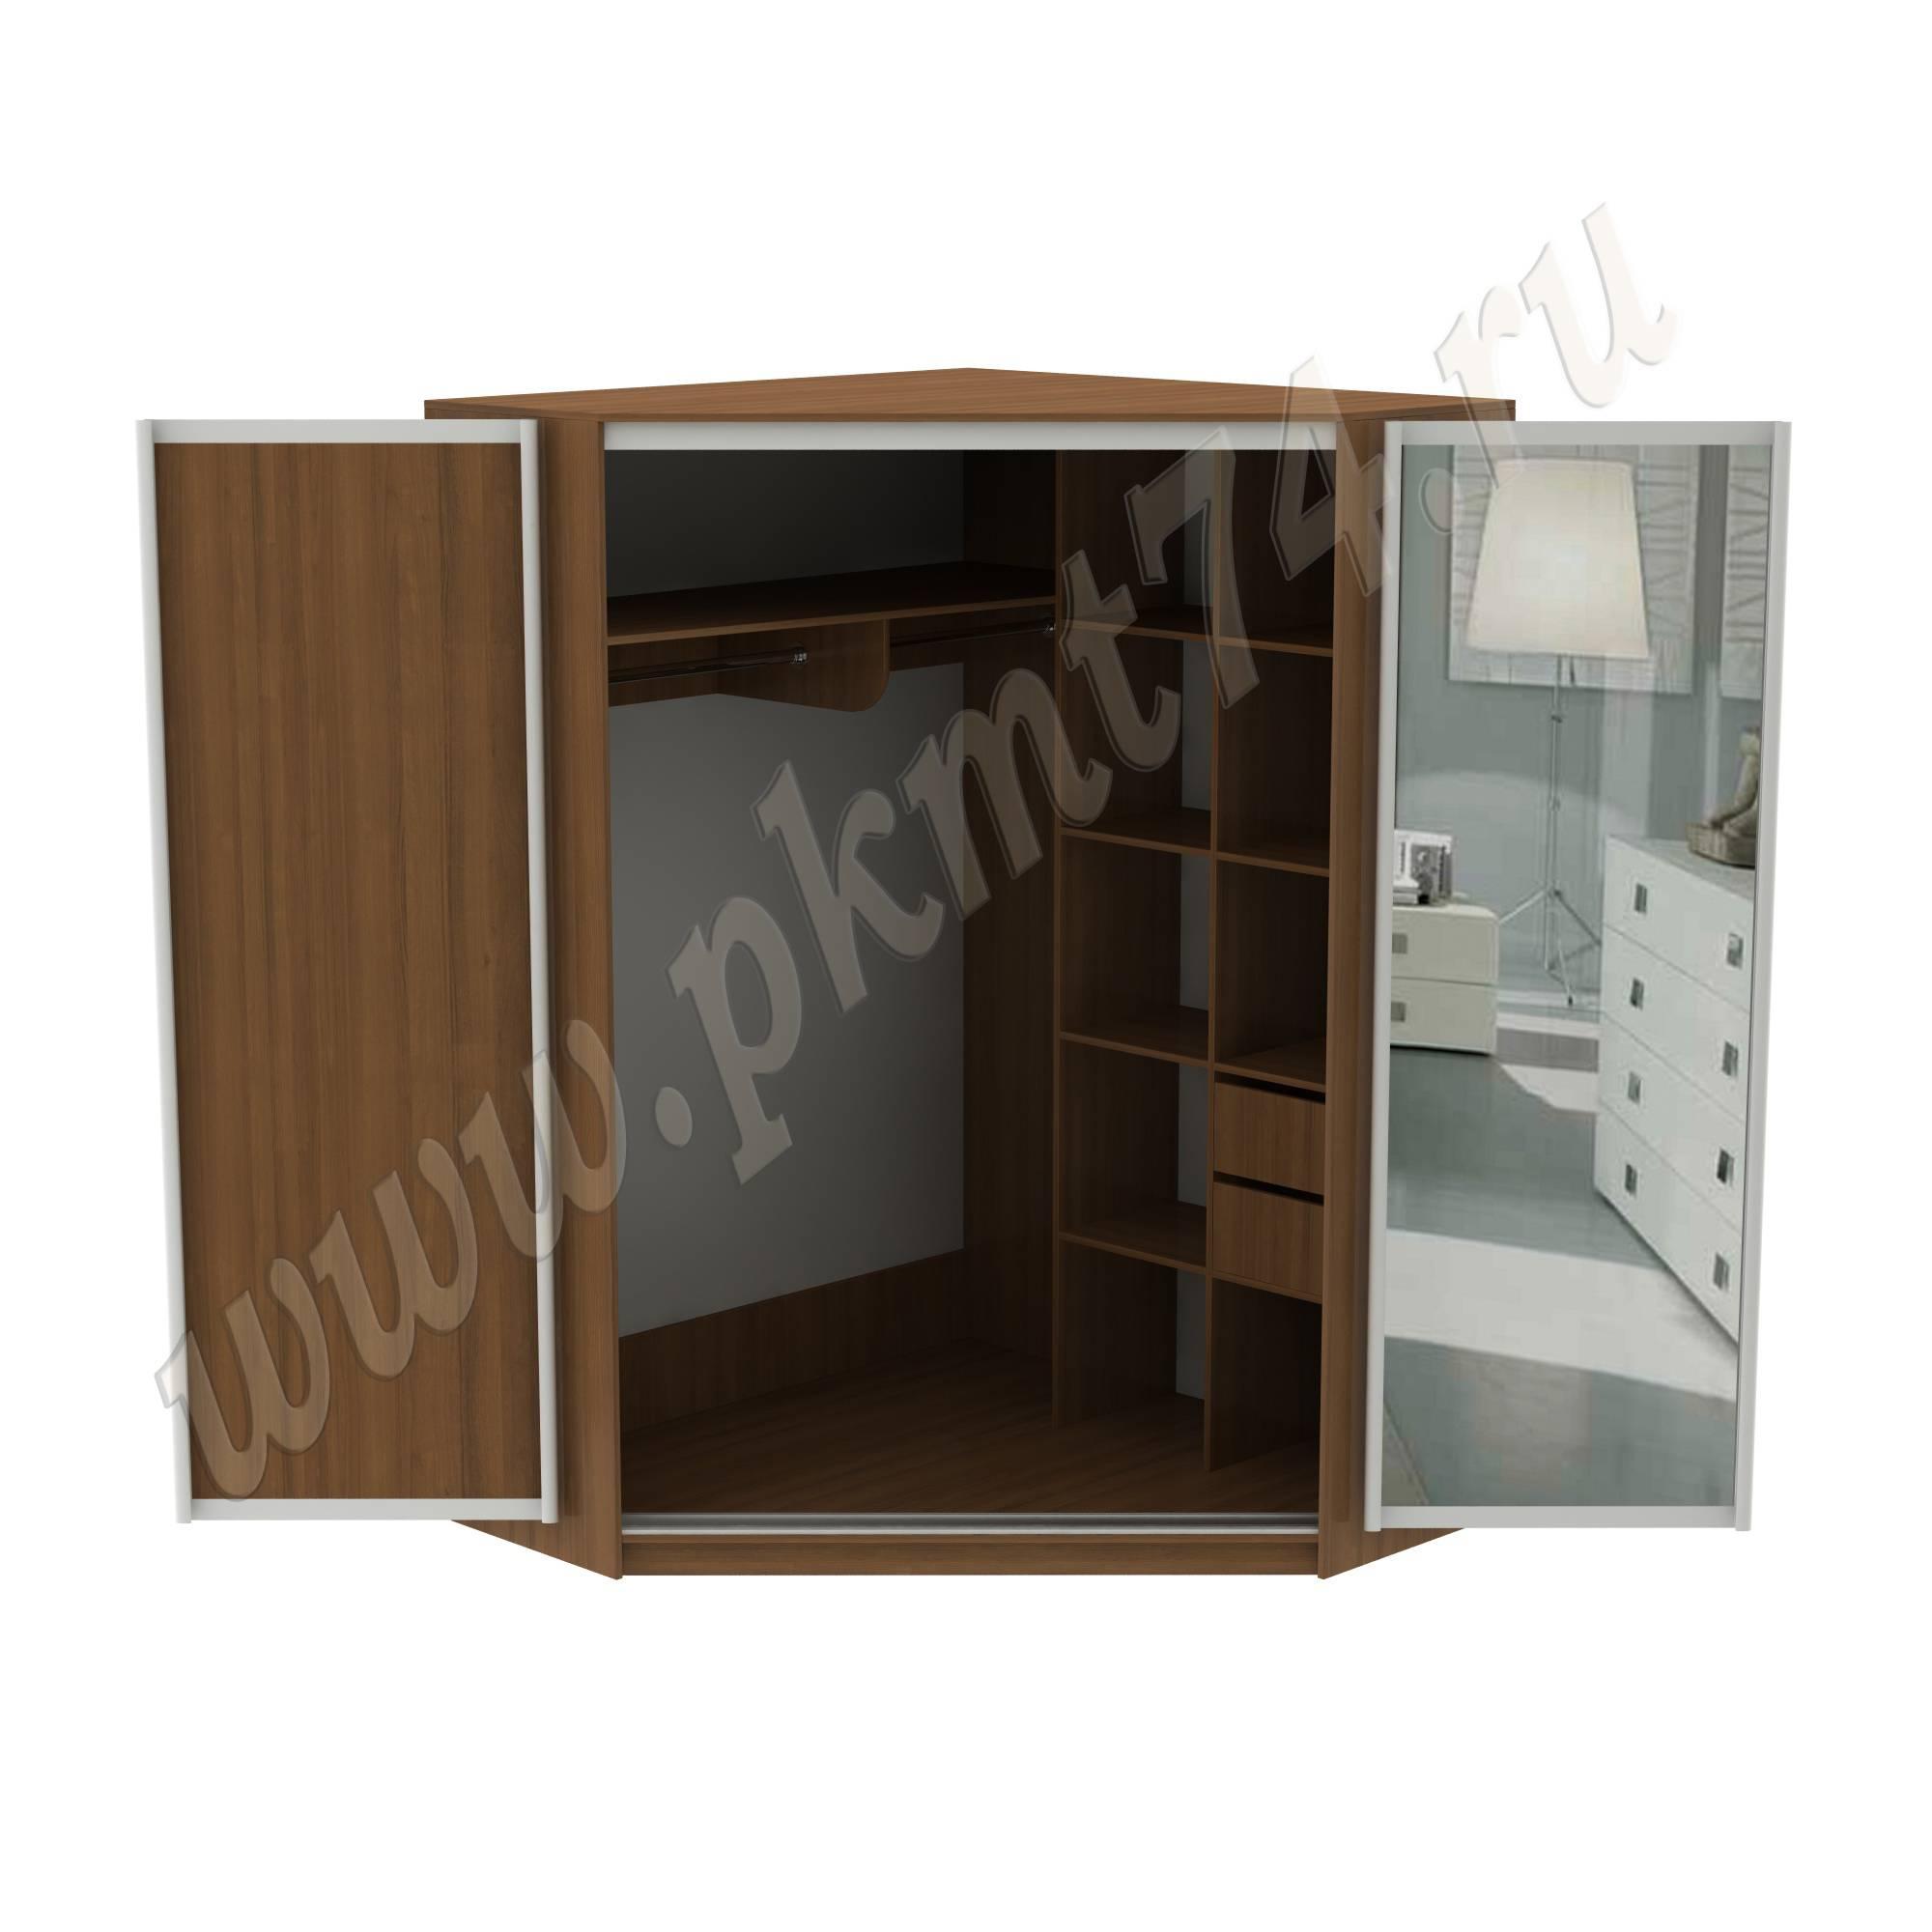 Угловой шкаф купе с зеркалом МТ 15-21 Орех